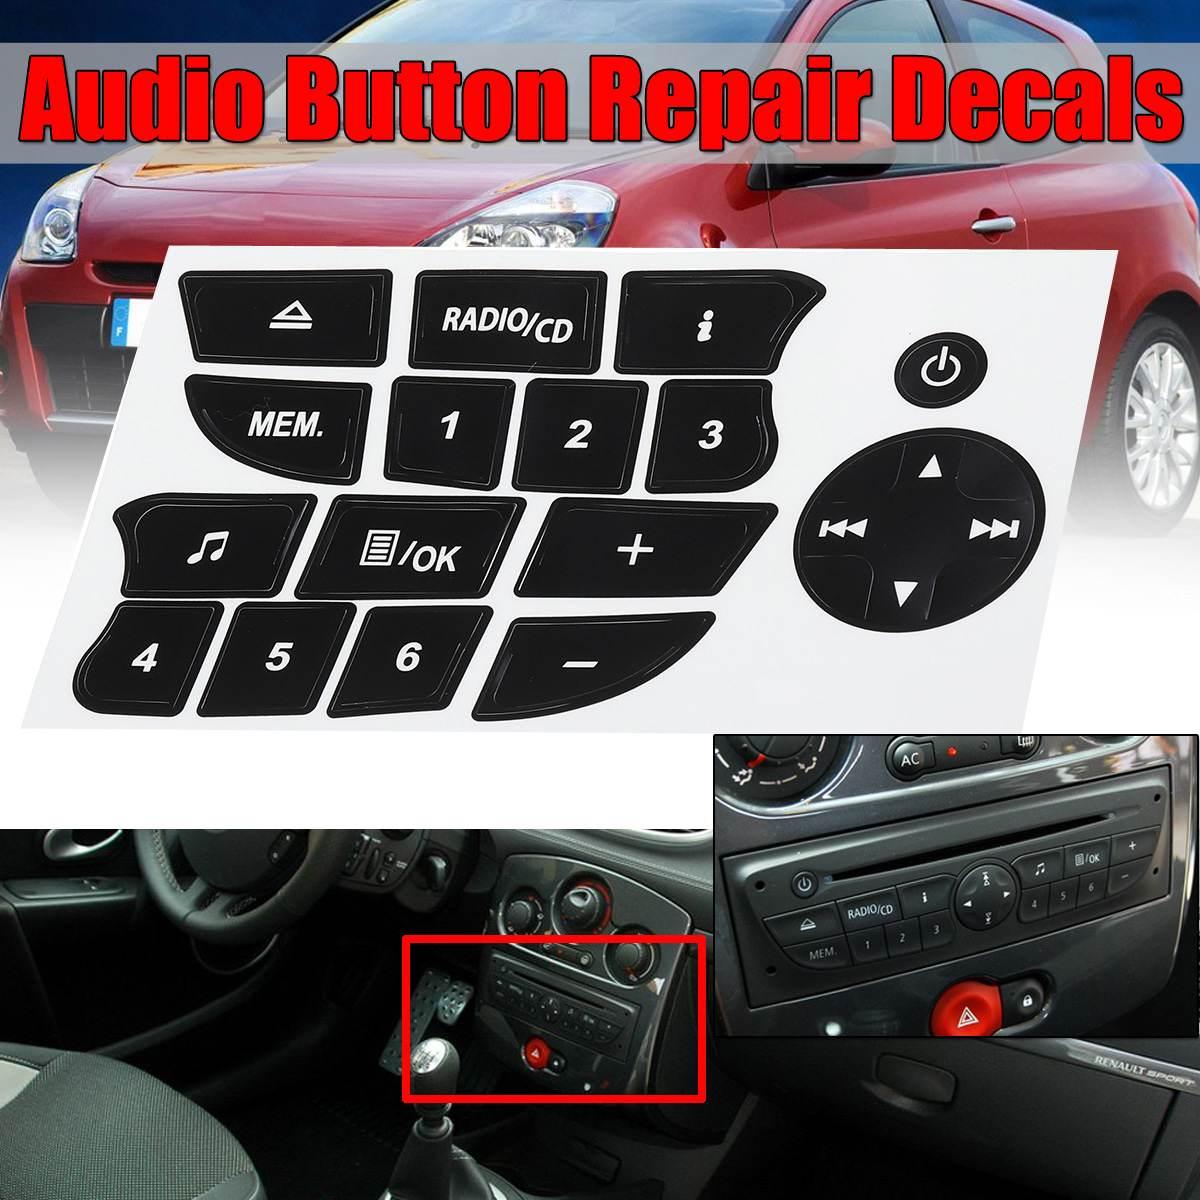 Radio renault  Renault Clio Radio Code Free Calculator